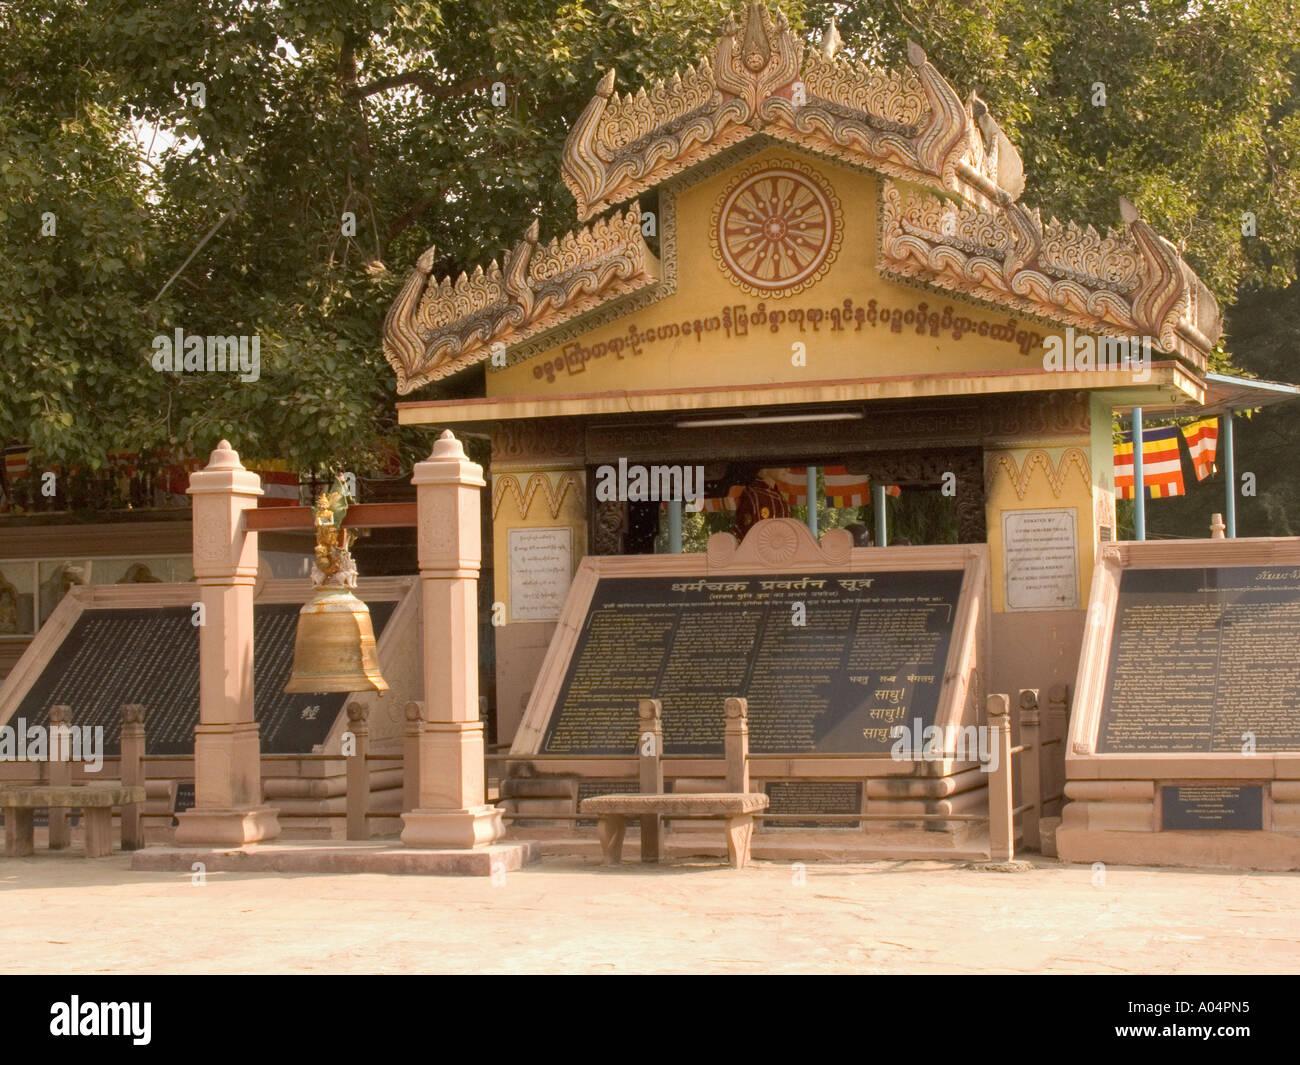 SARNATH UTTAR PRADESH INDIA November Vihara with a bell donated by the Japanese at this holy site - Stock Image